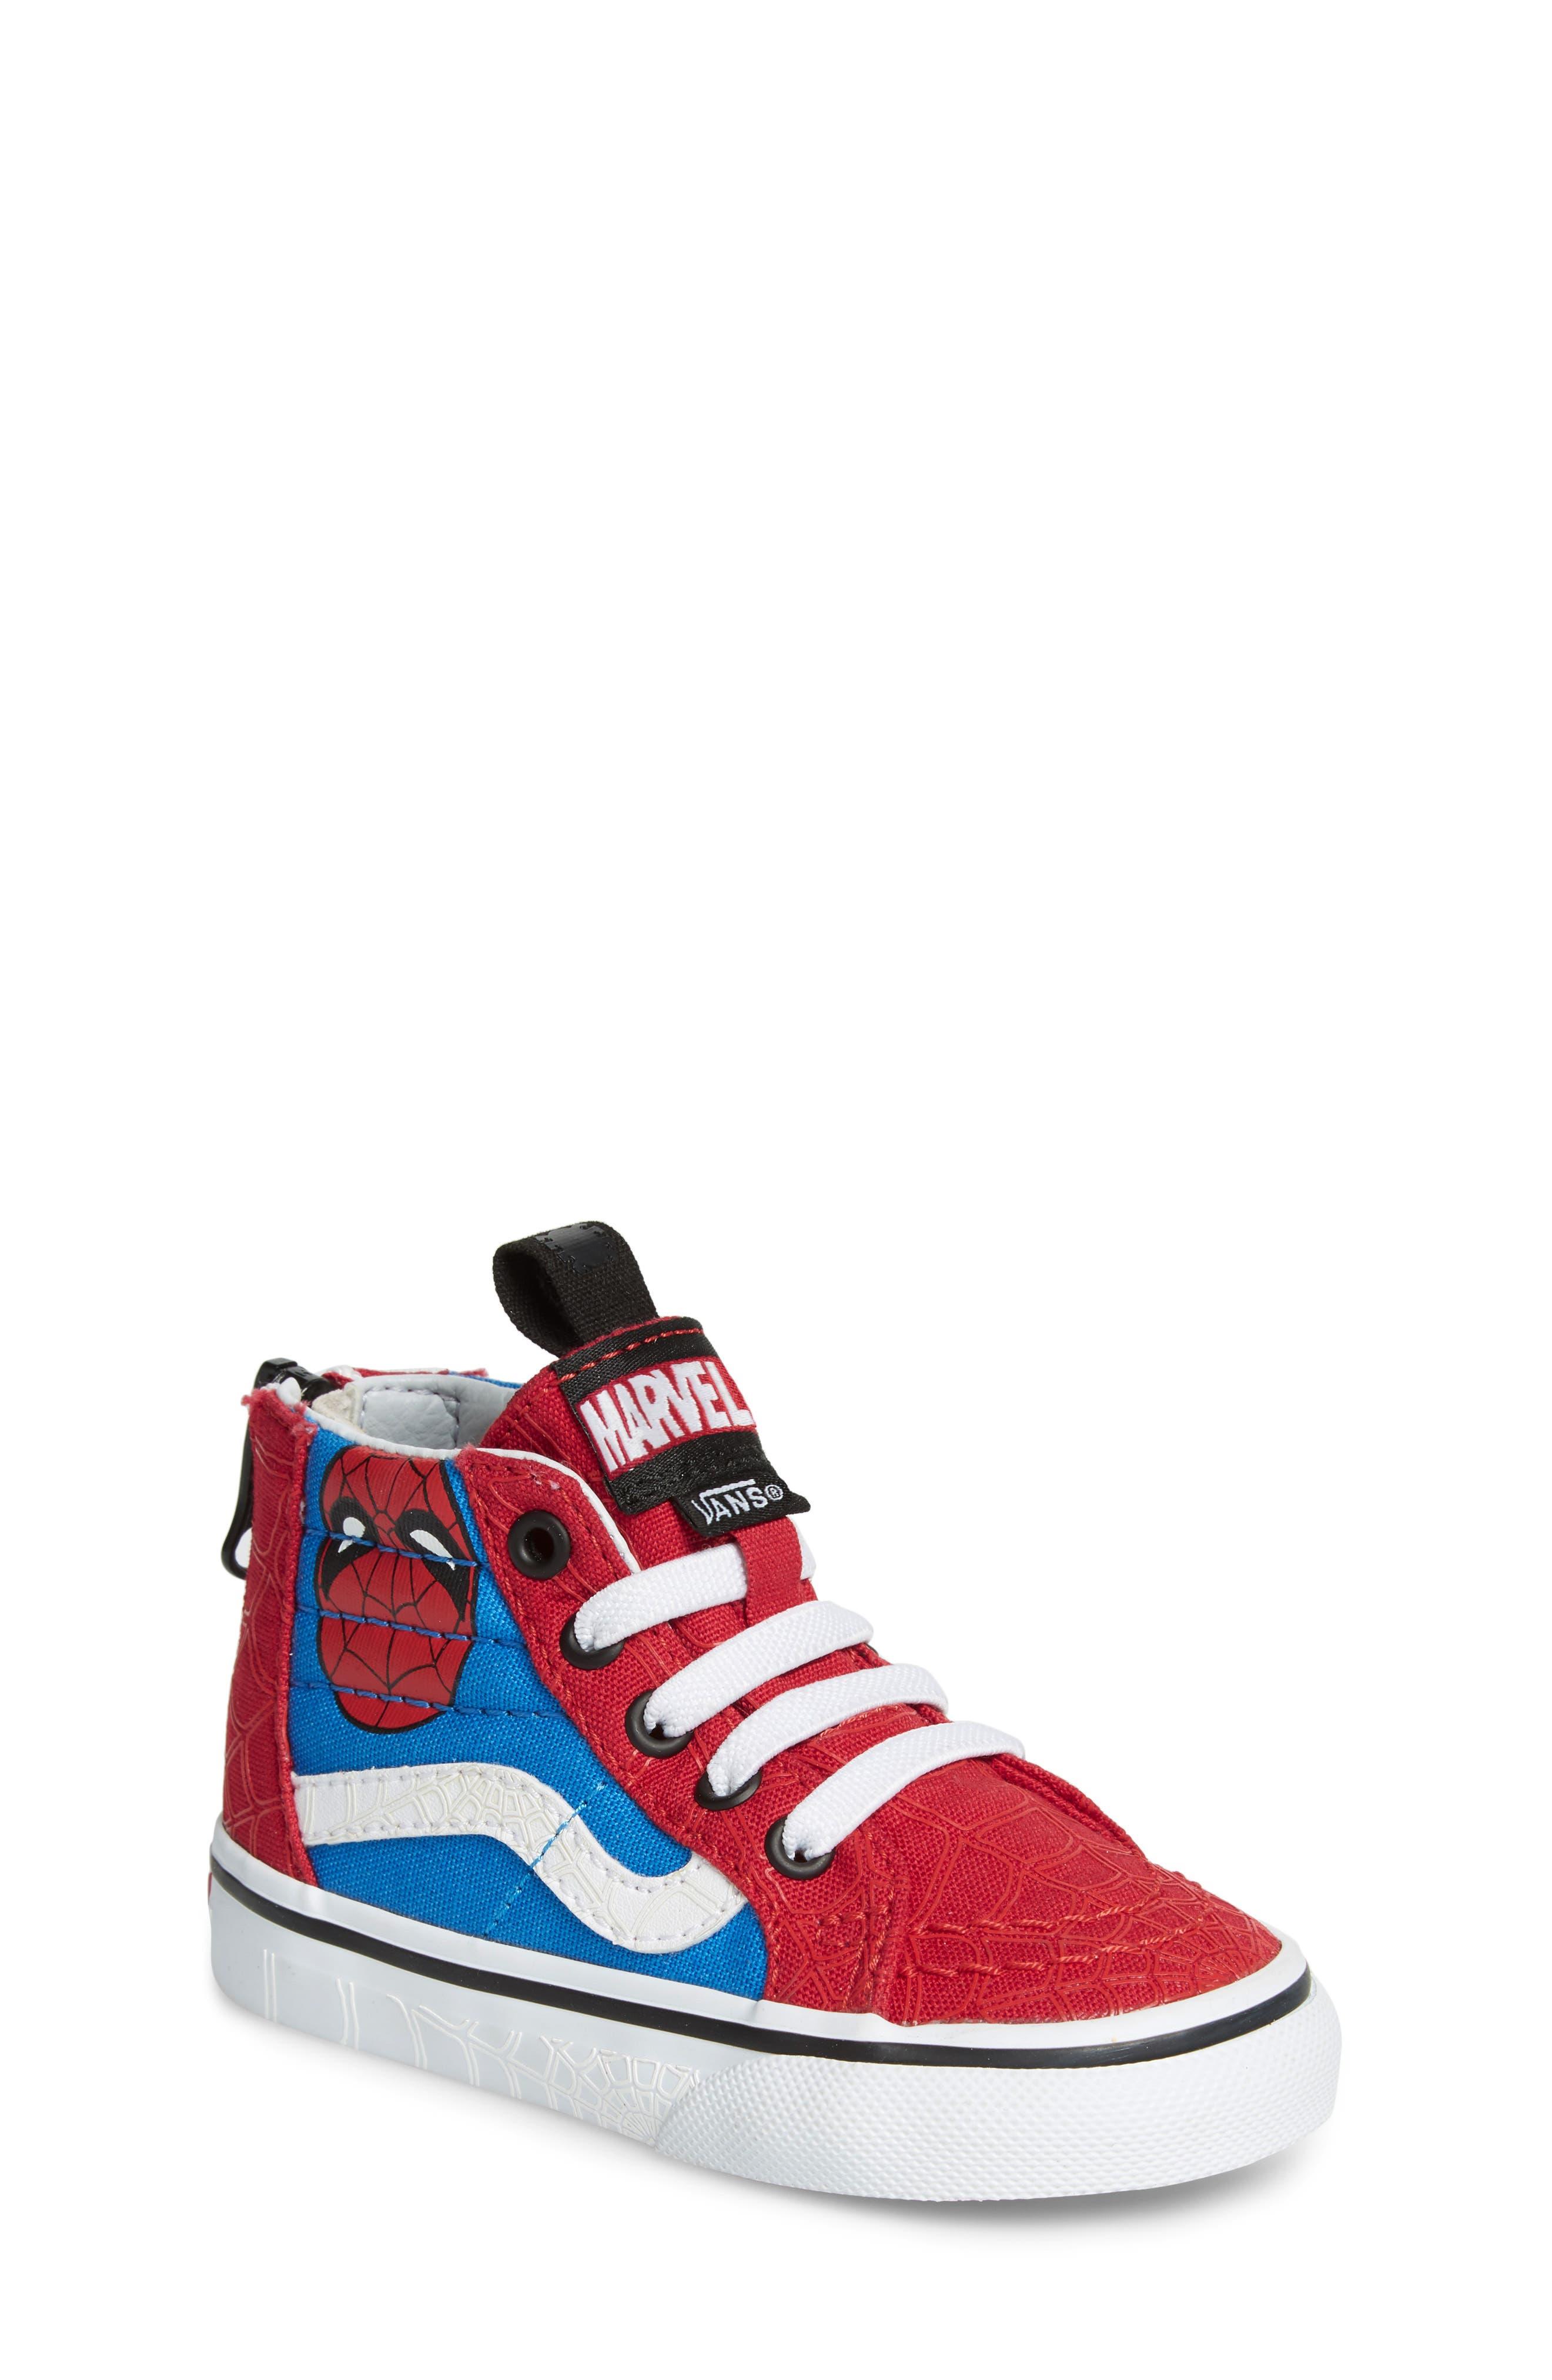 x Marvel<sup>®</sup> Spider-Man SK8-Hi Sneaker,                             Main thumbnail 1, color,